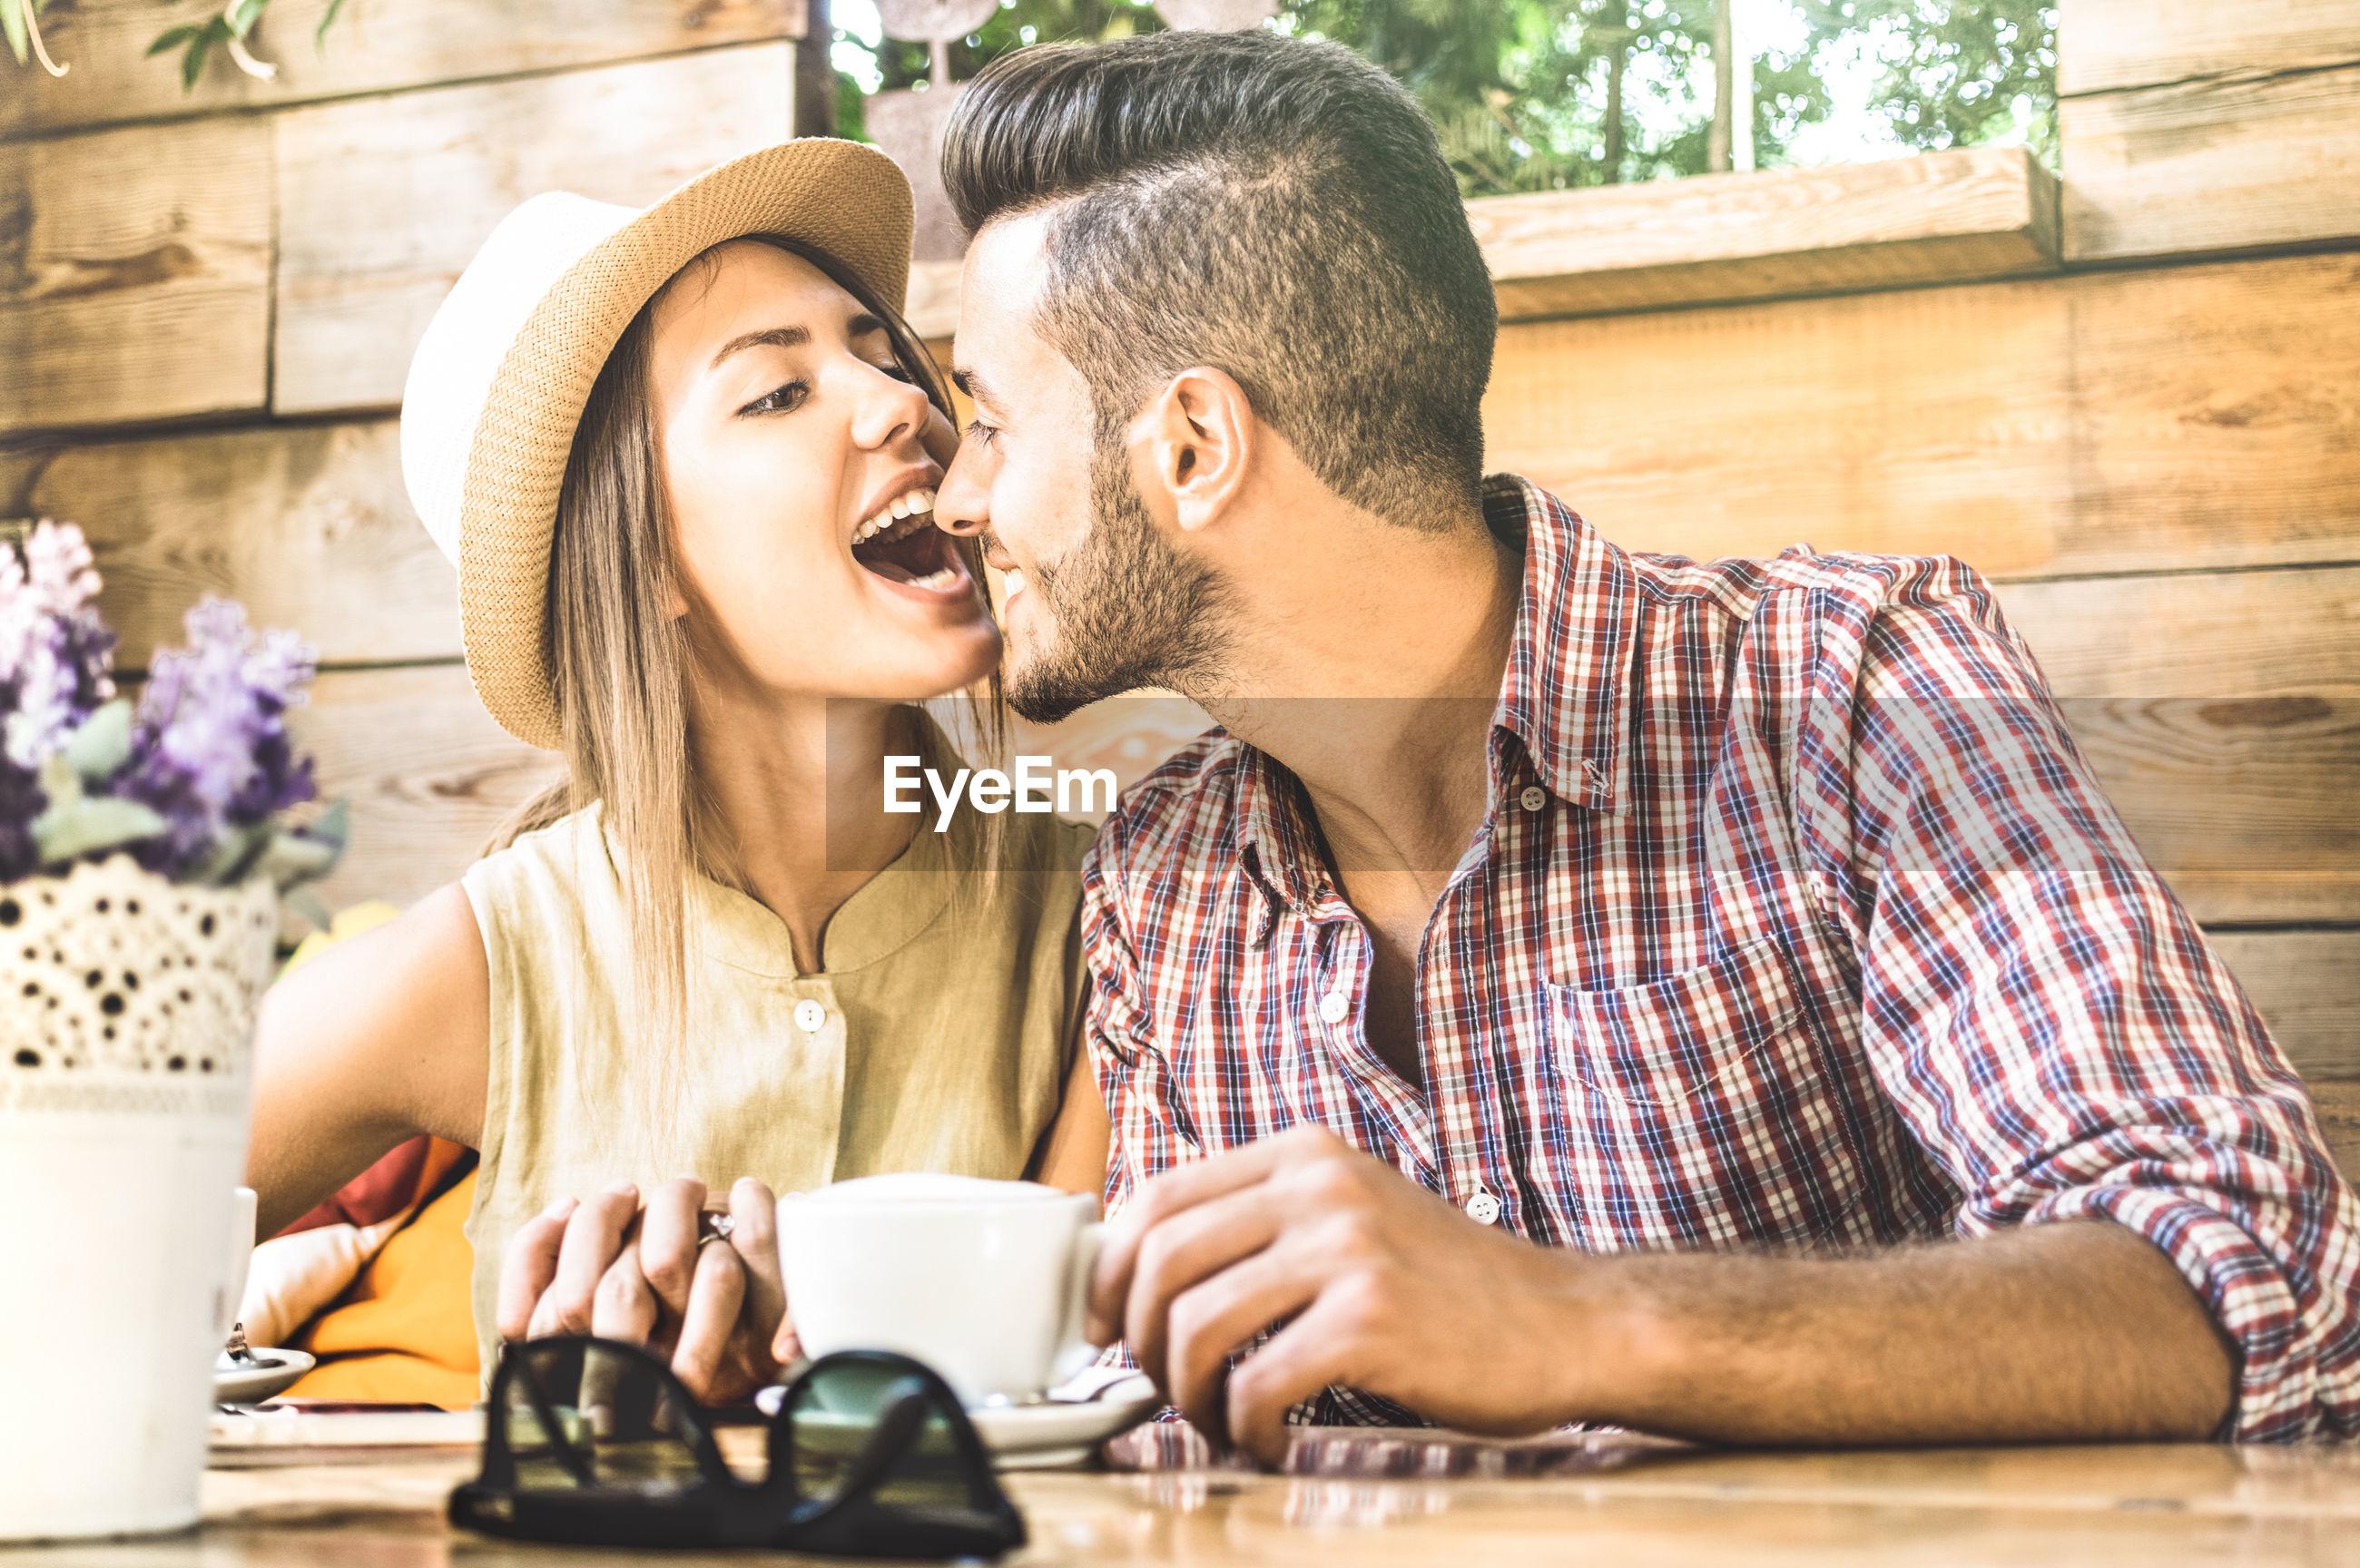 Romantic tourist couple spending leisure time at outdoor restaurant